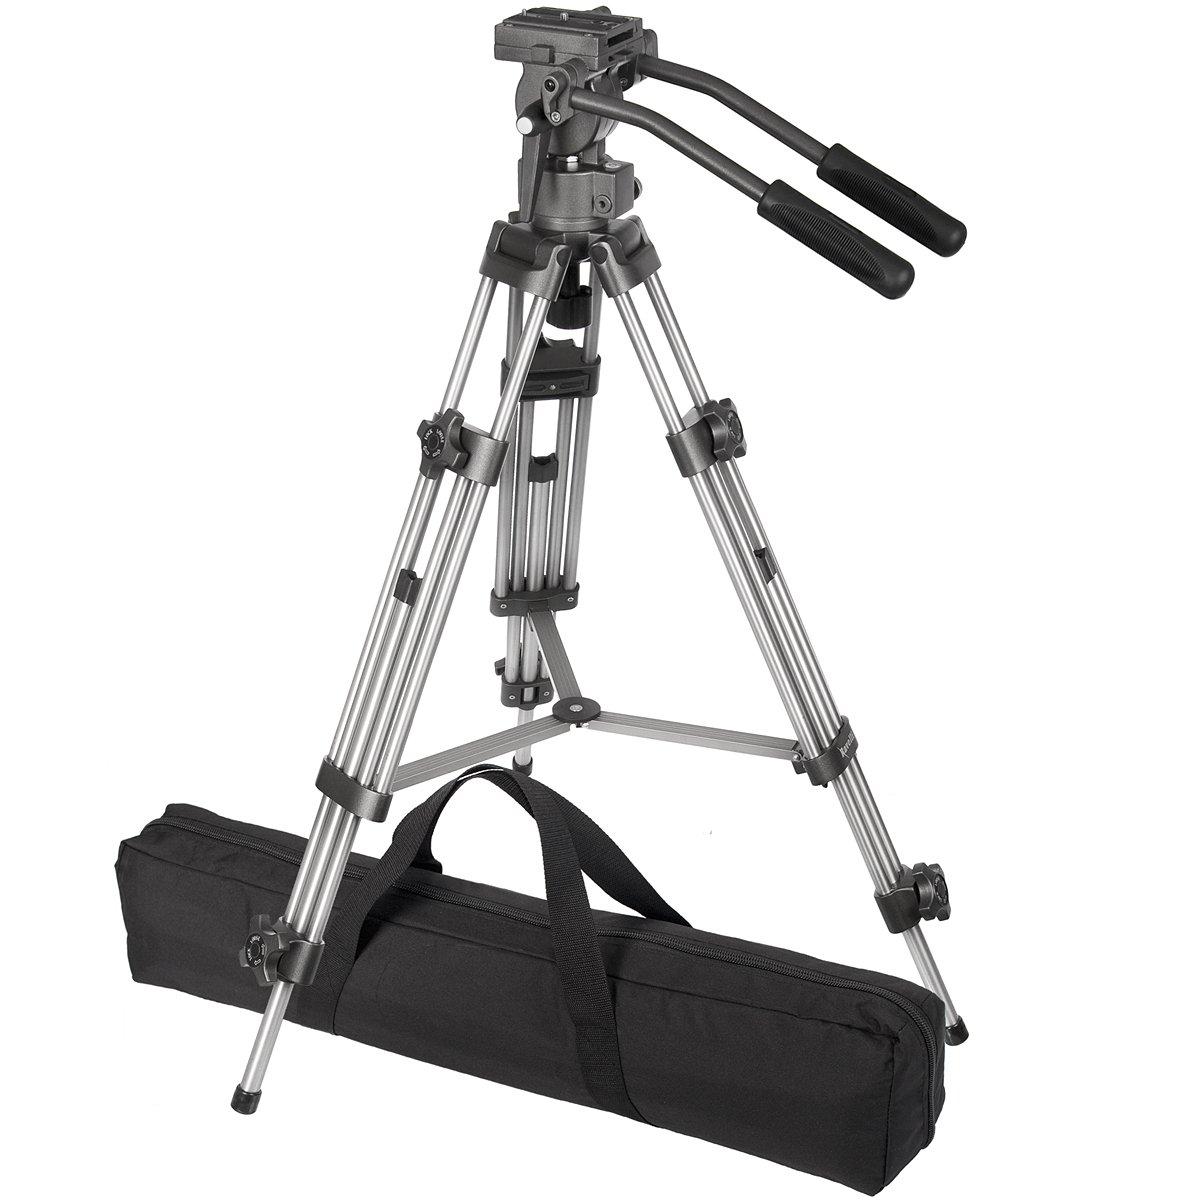 Ravelli AVTP Professional 65mm Video Camera Tripod with Fluid Drag Head by Ravelli